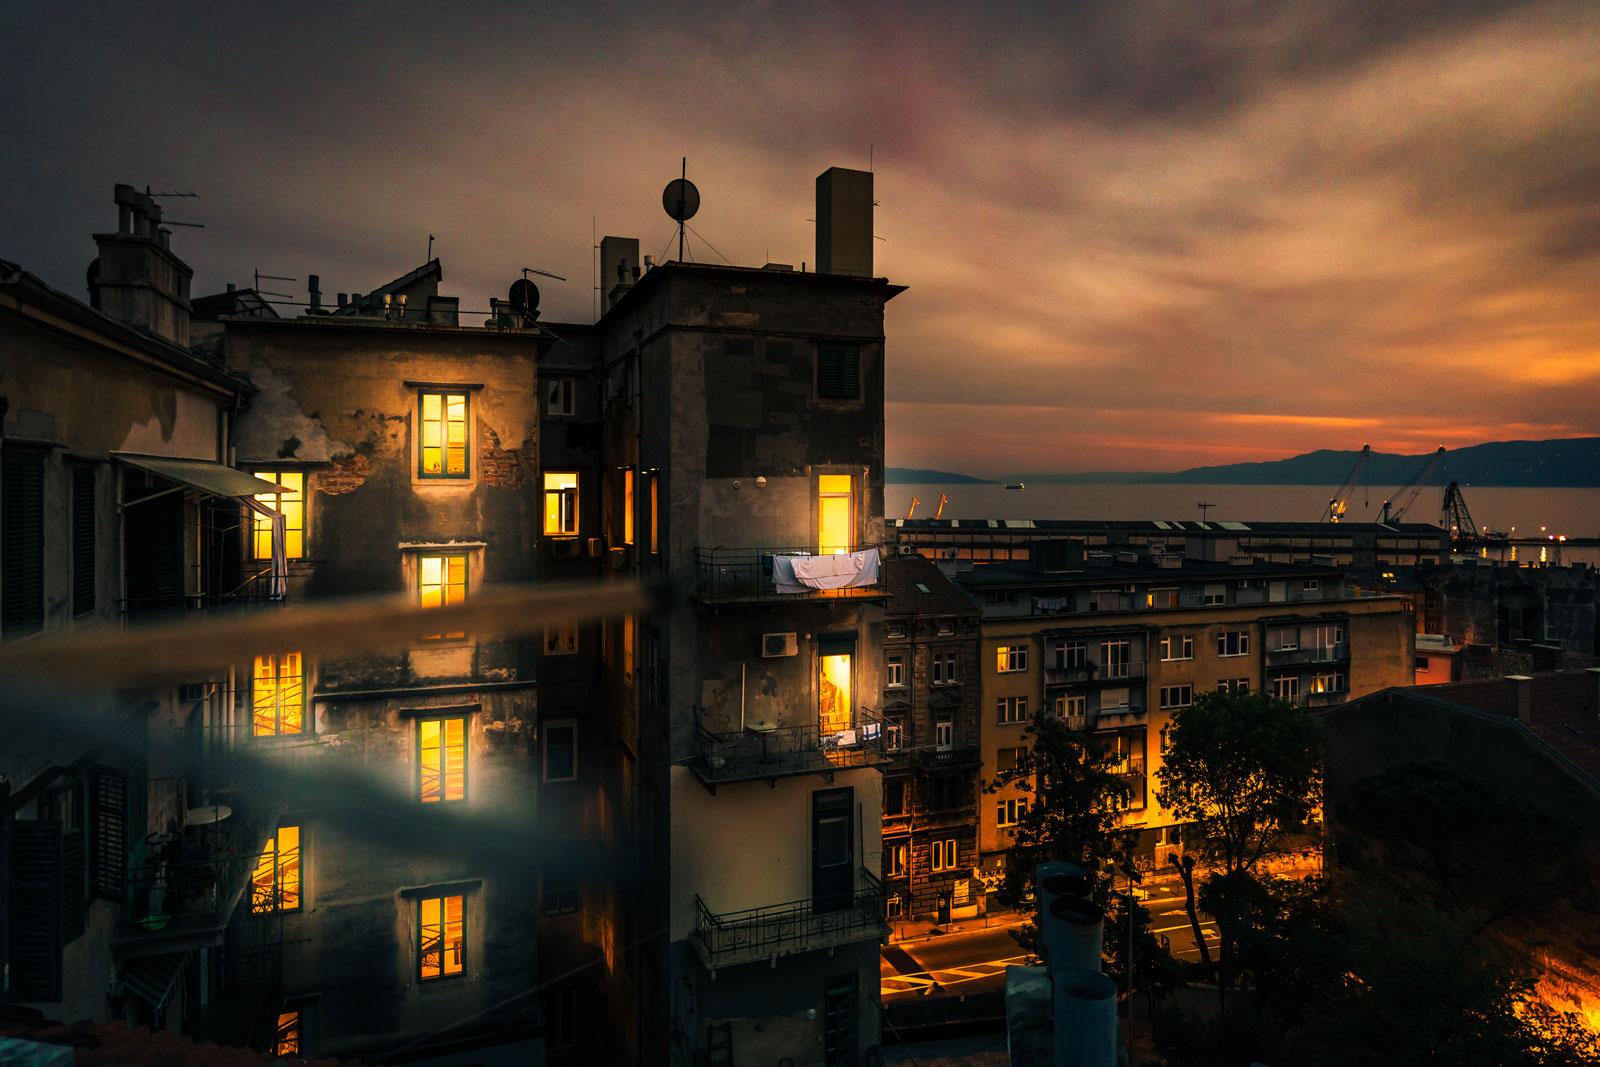 Fotografia Vladimir Soic - senny krajobraz dachu